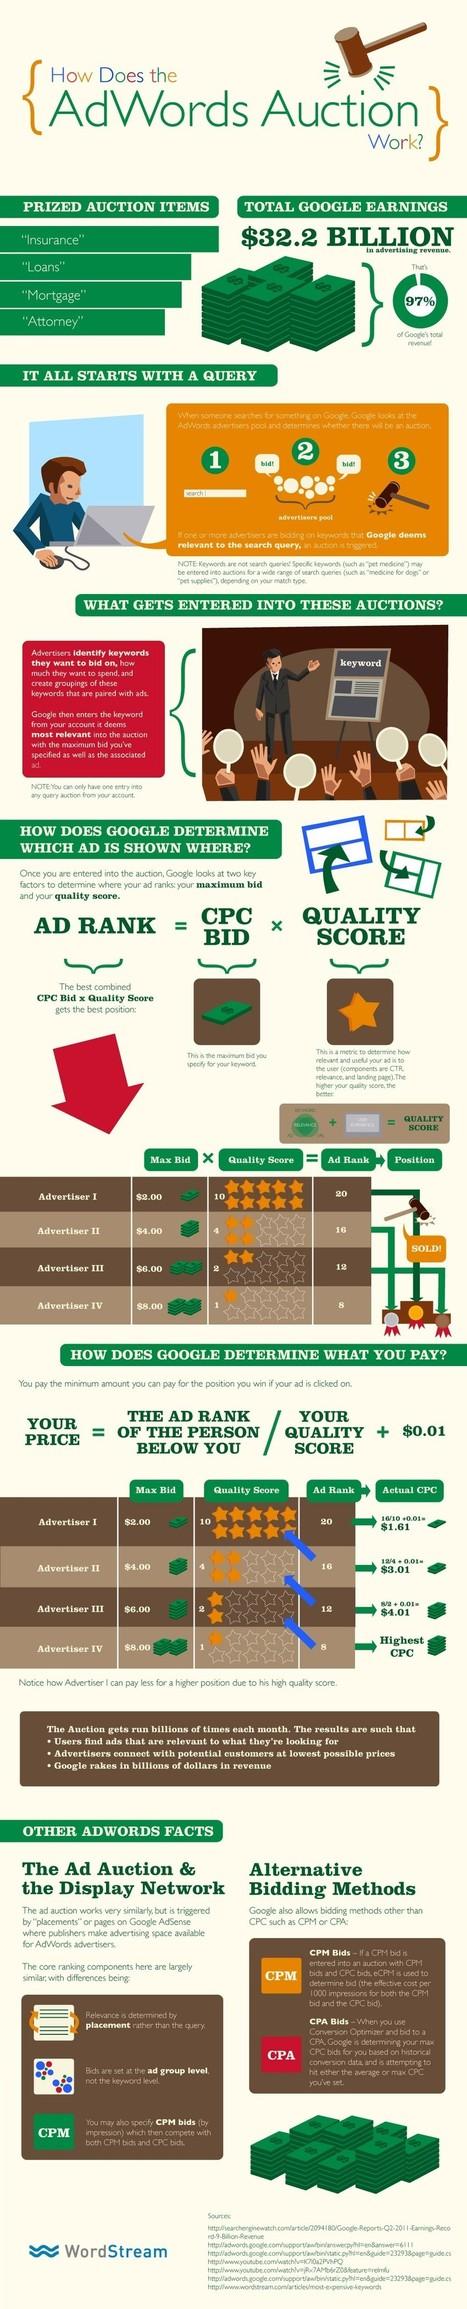 Google Billion Dollar Adword Auction Secrets Revealed | Digital & Social Media Marketing | Scoop.it